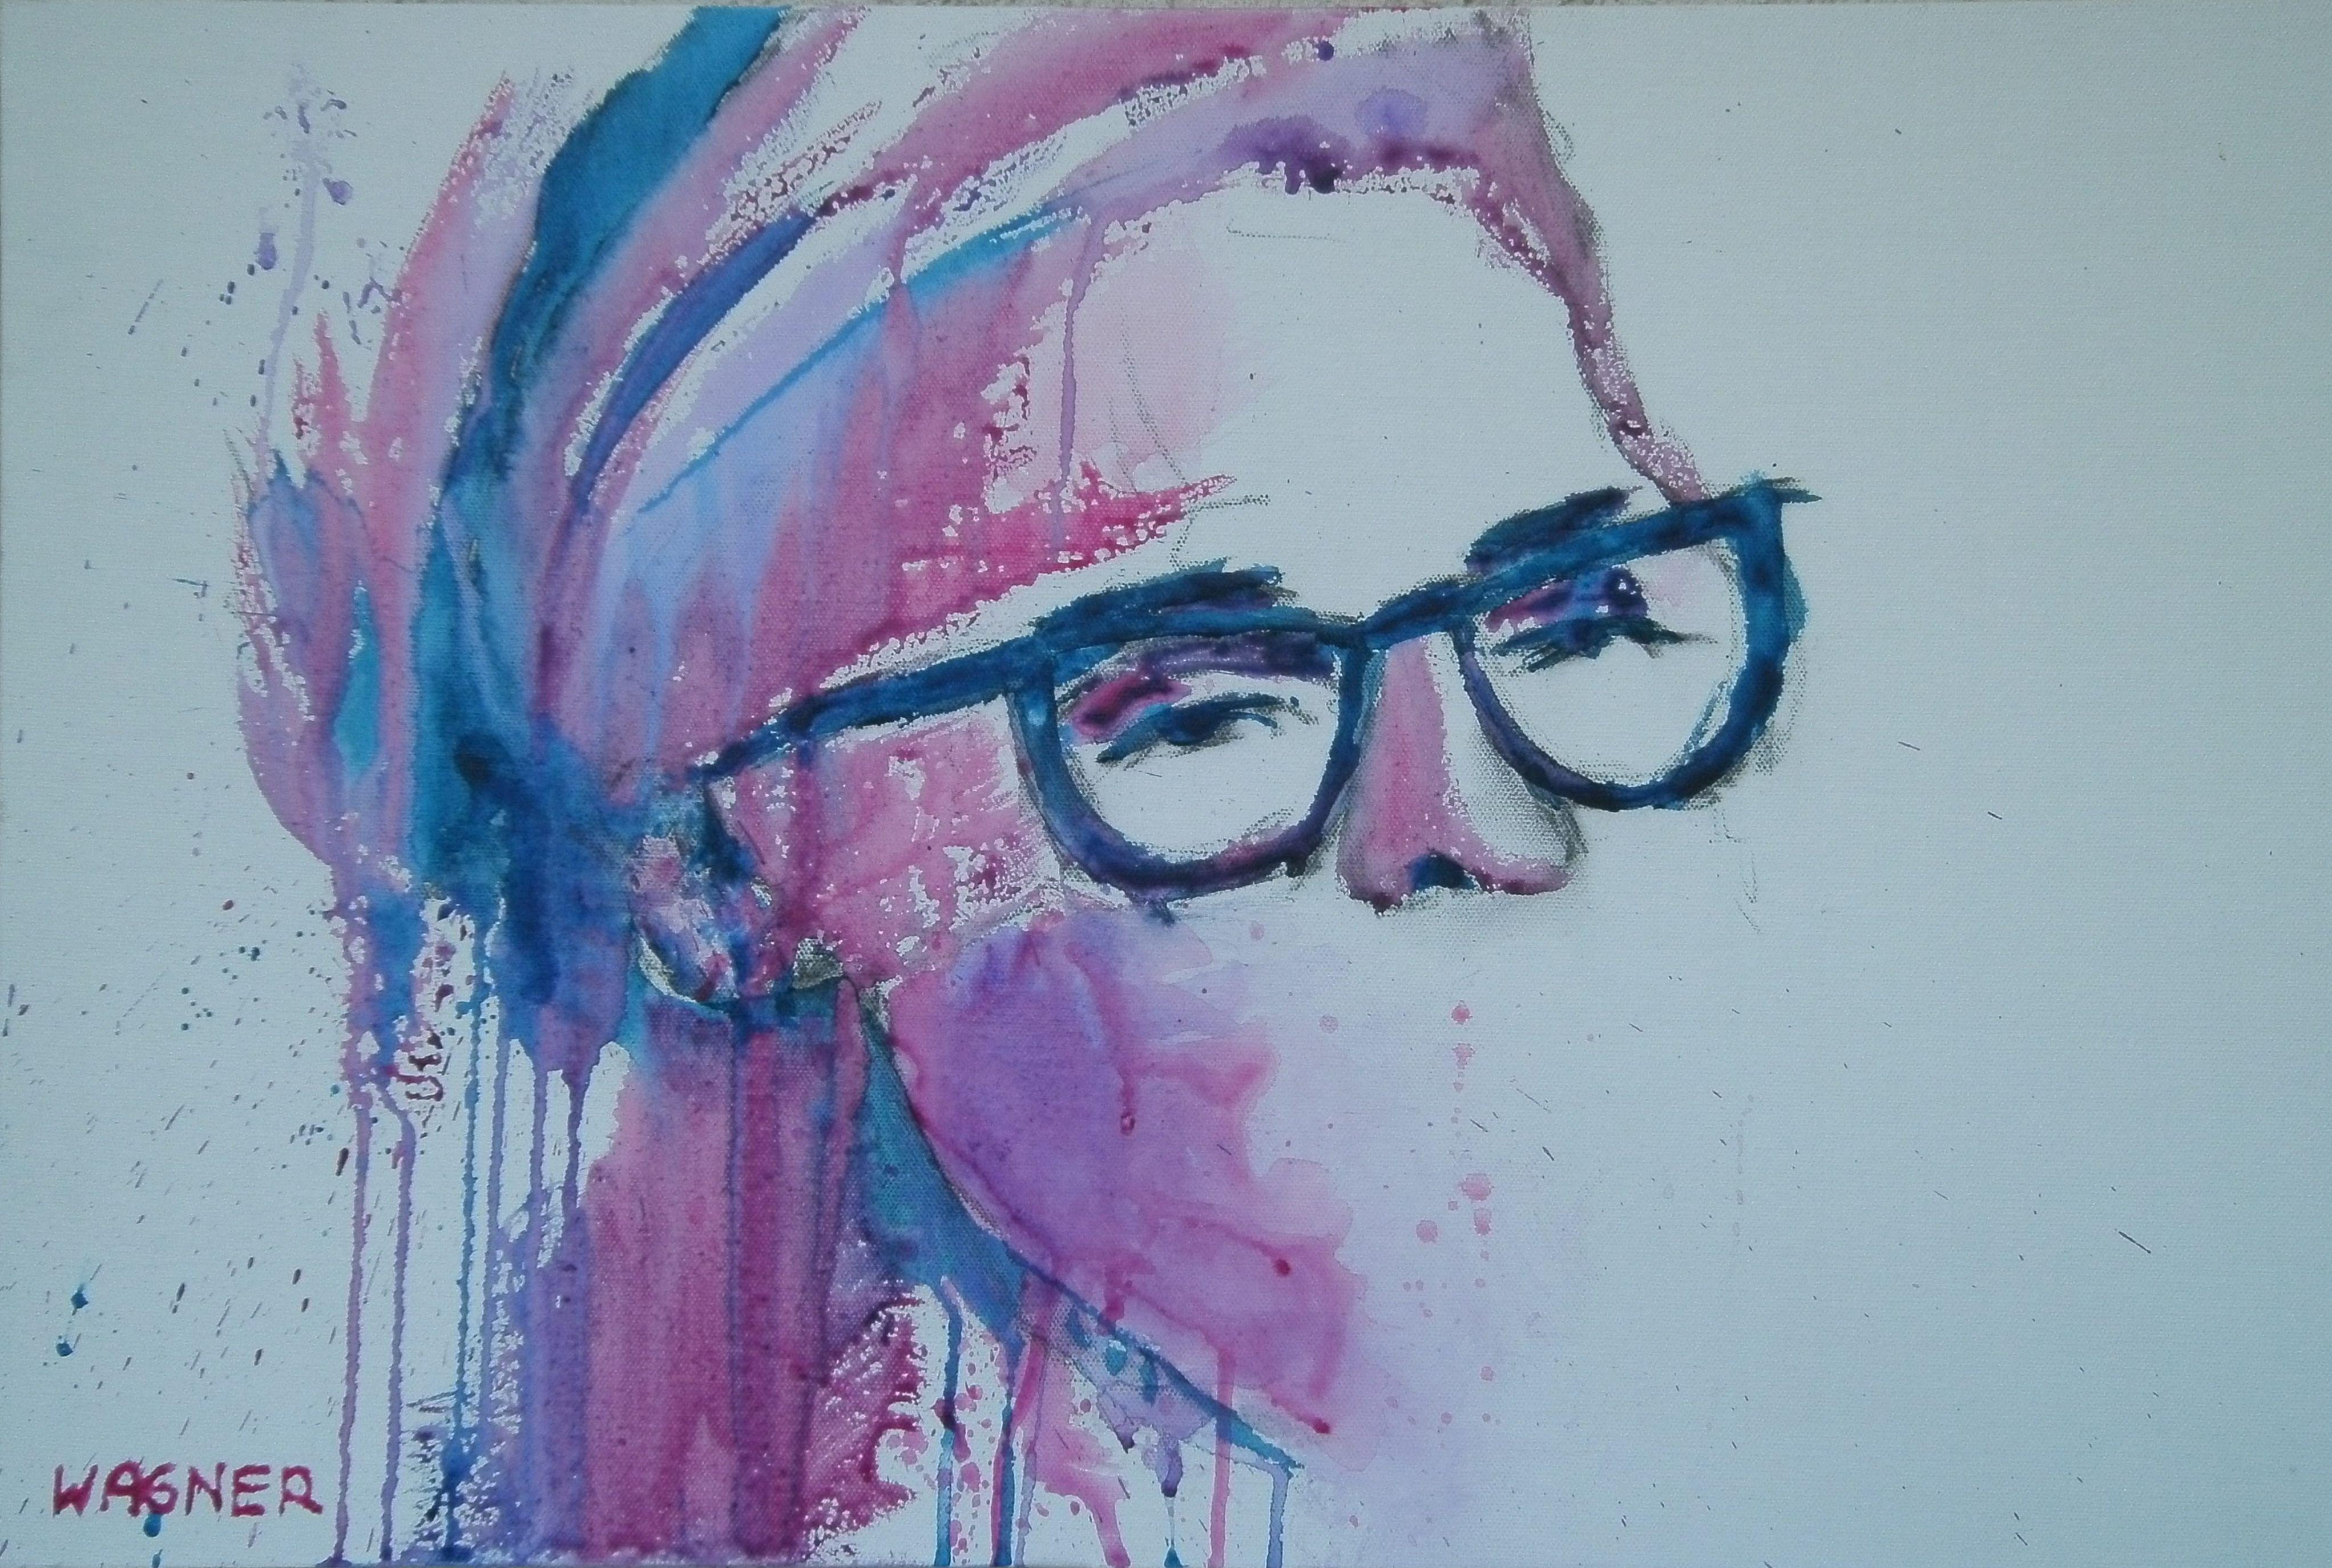 Woman Face inspiriert durch Florian NICOLLE , Acryl auf Leinwand